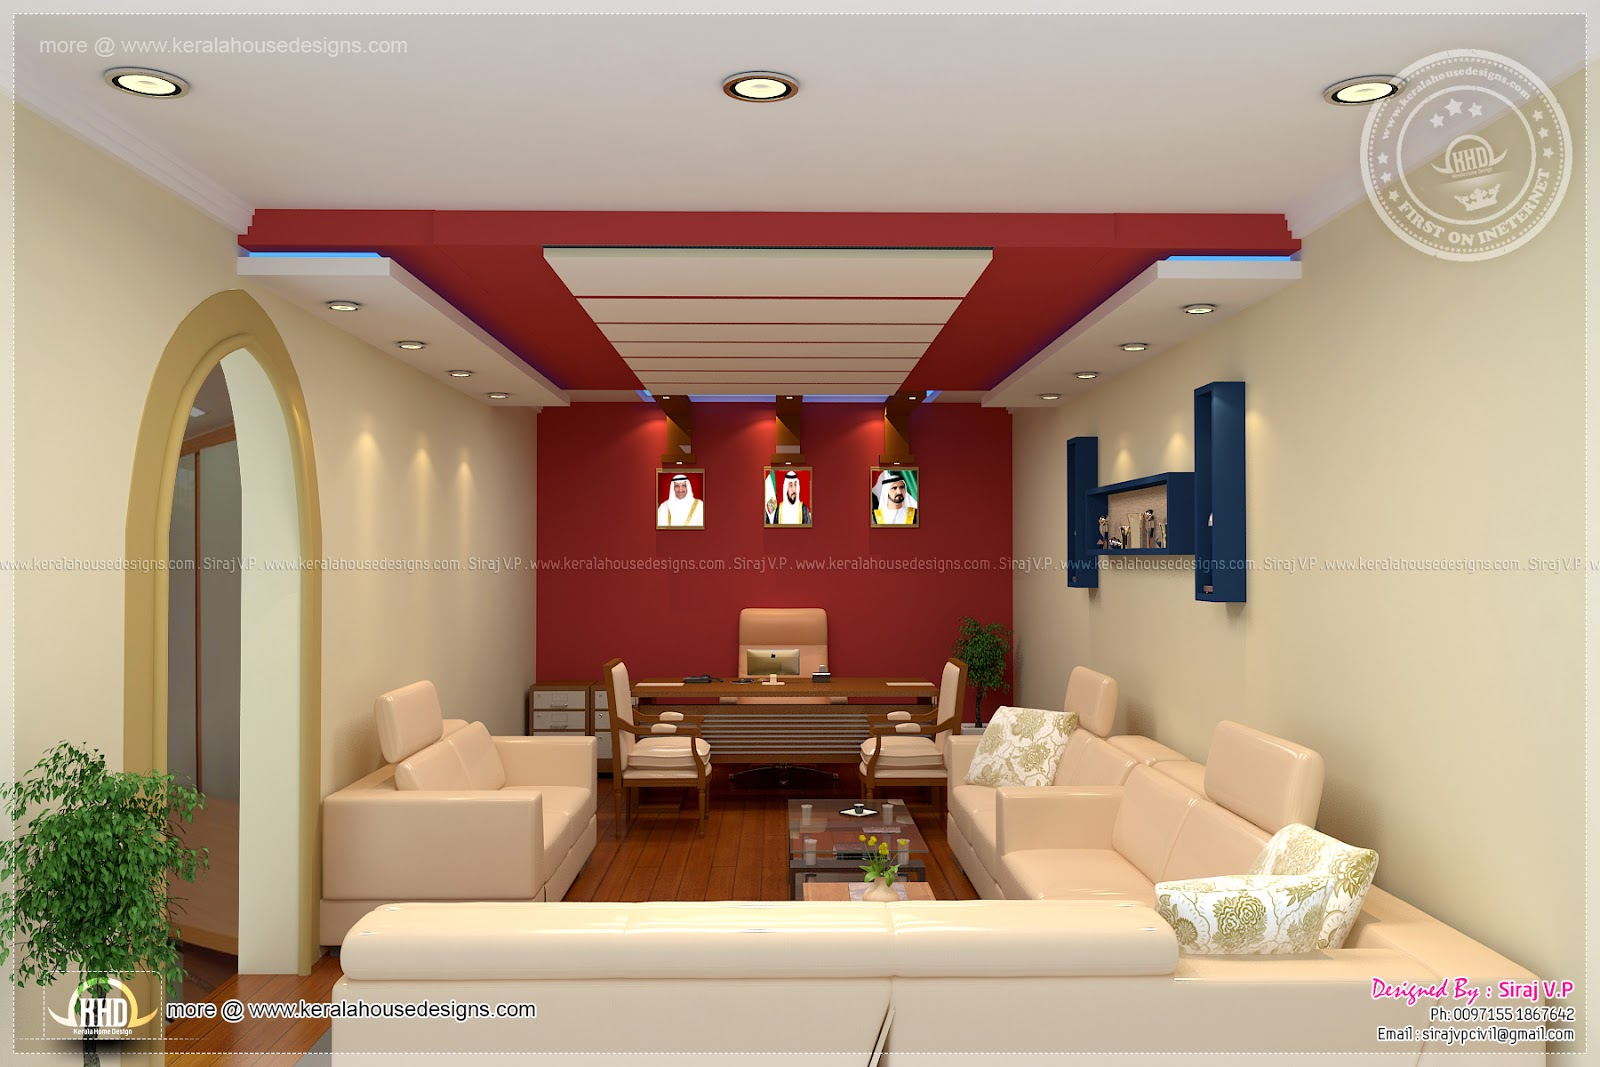 Home office interior design by Siraj V.P - Kerala home ...